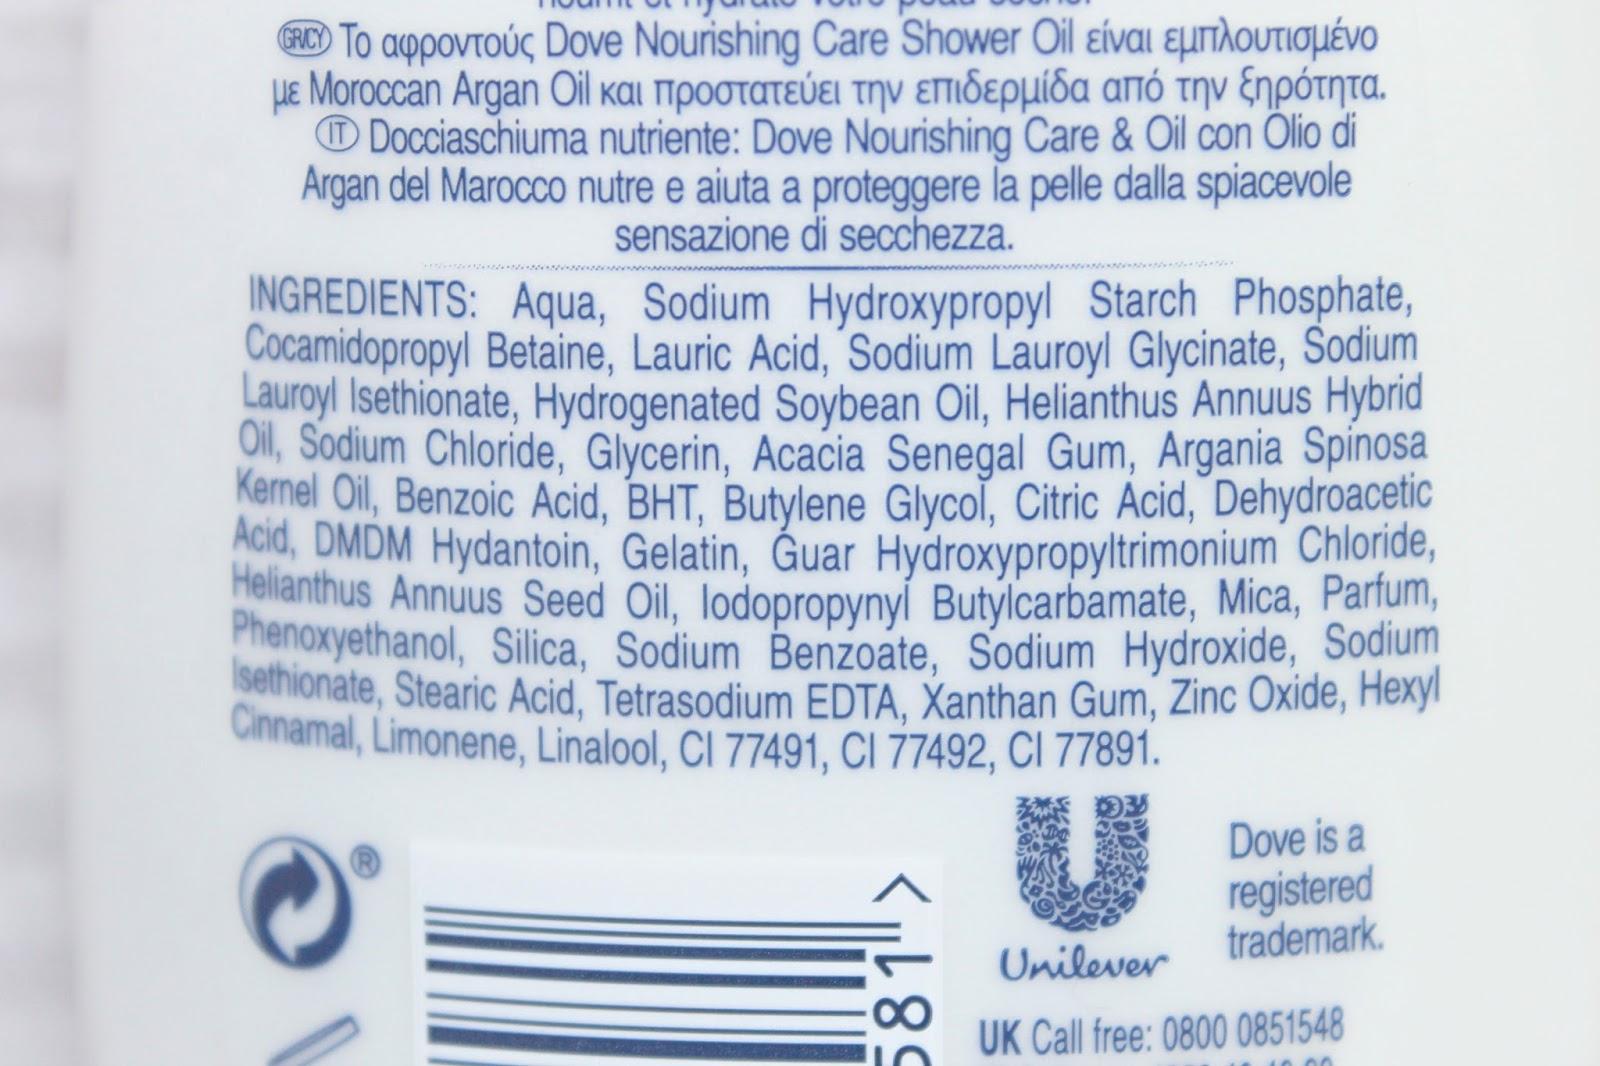 ingrediënten dove nourishing care & oil body wash